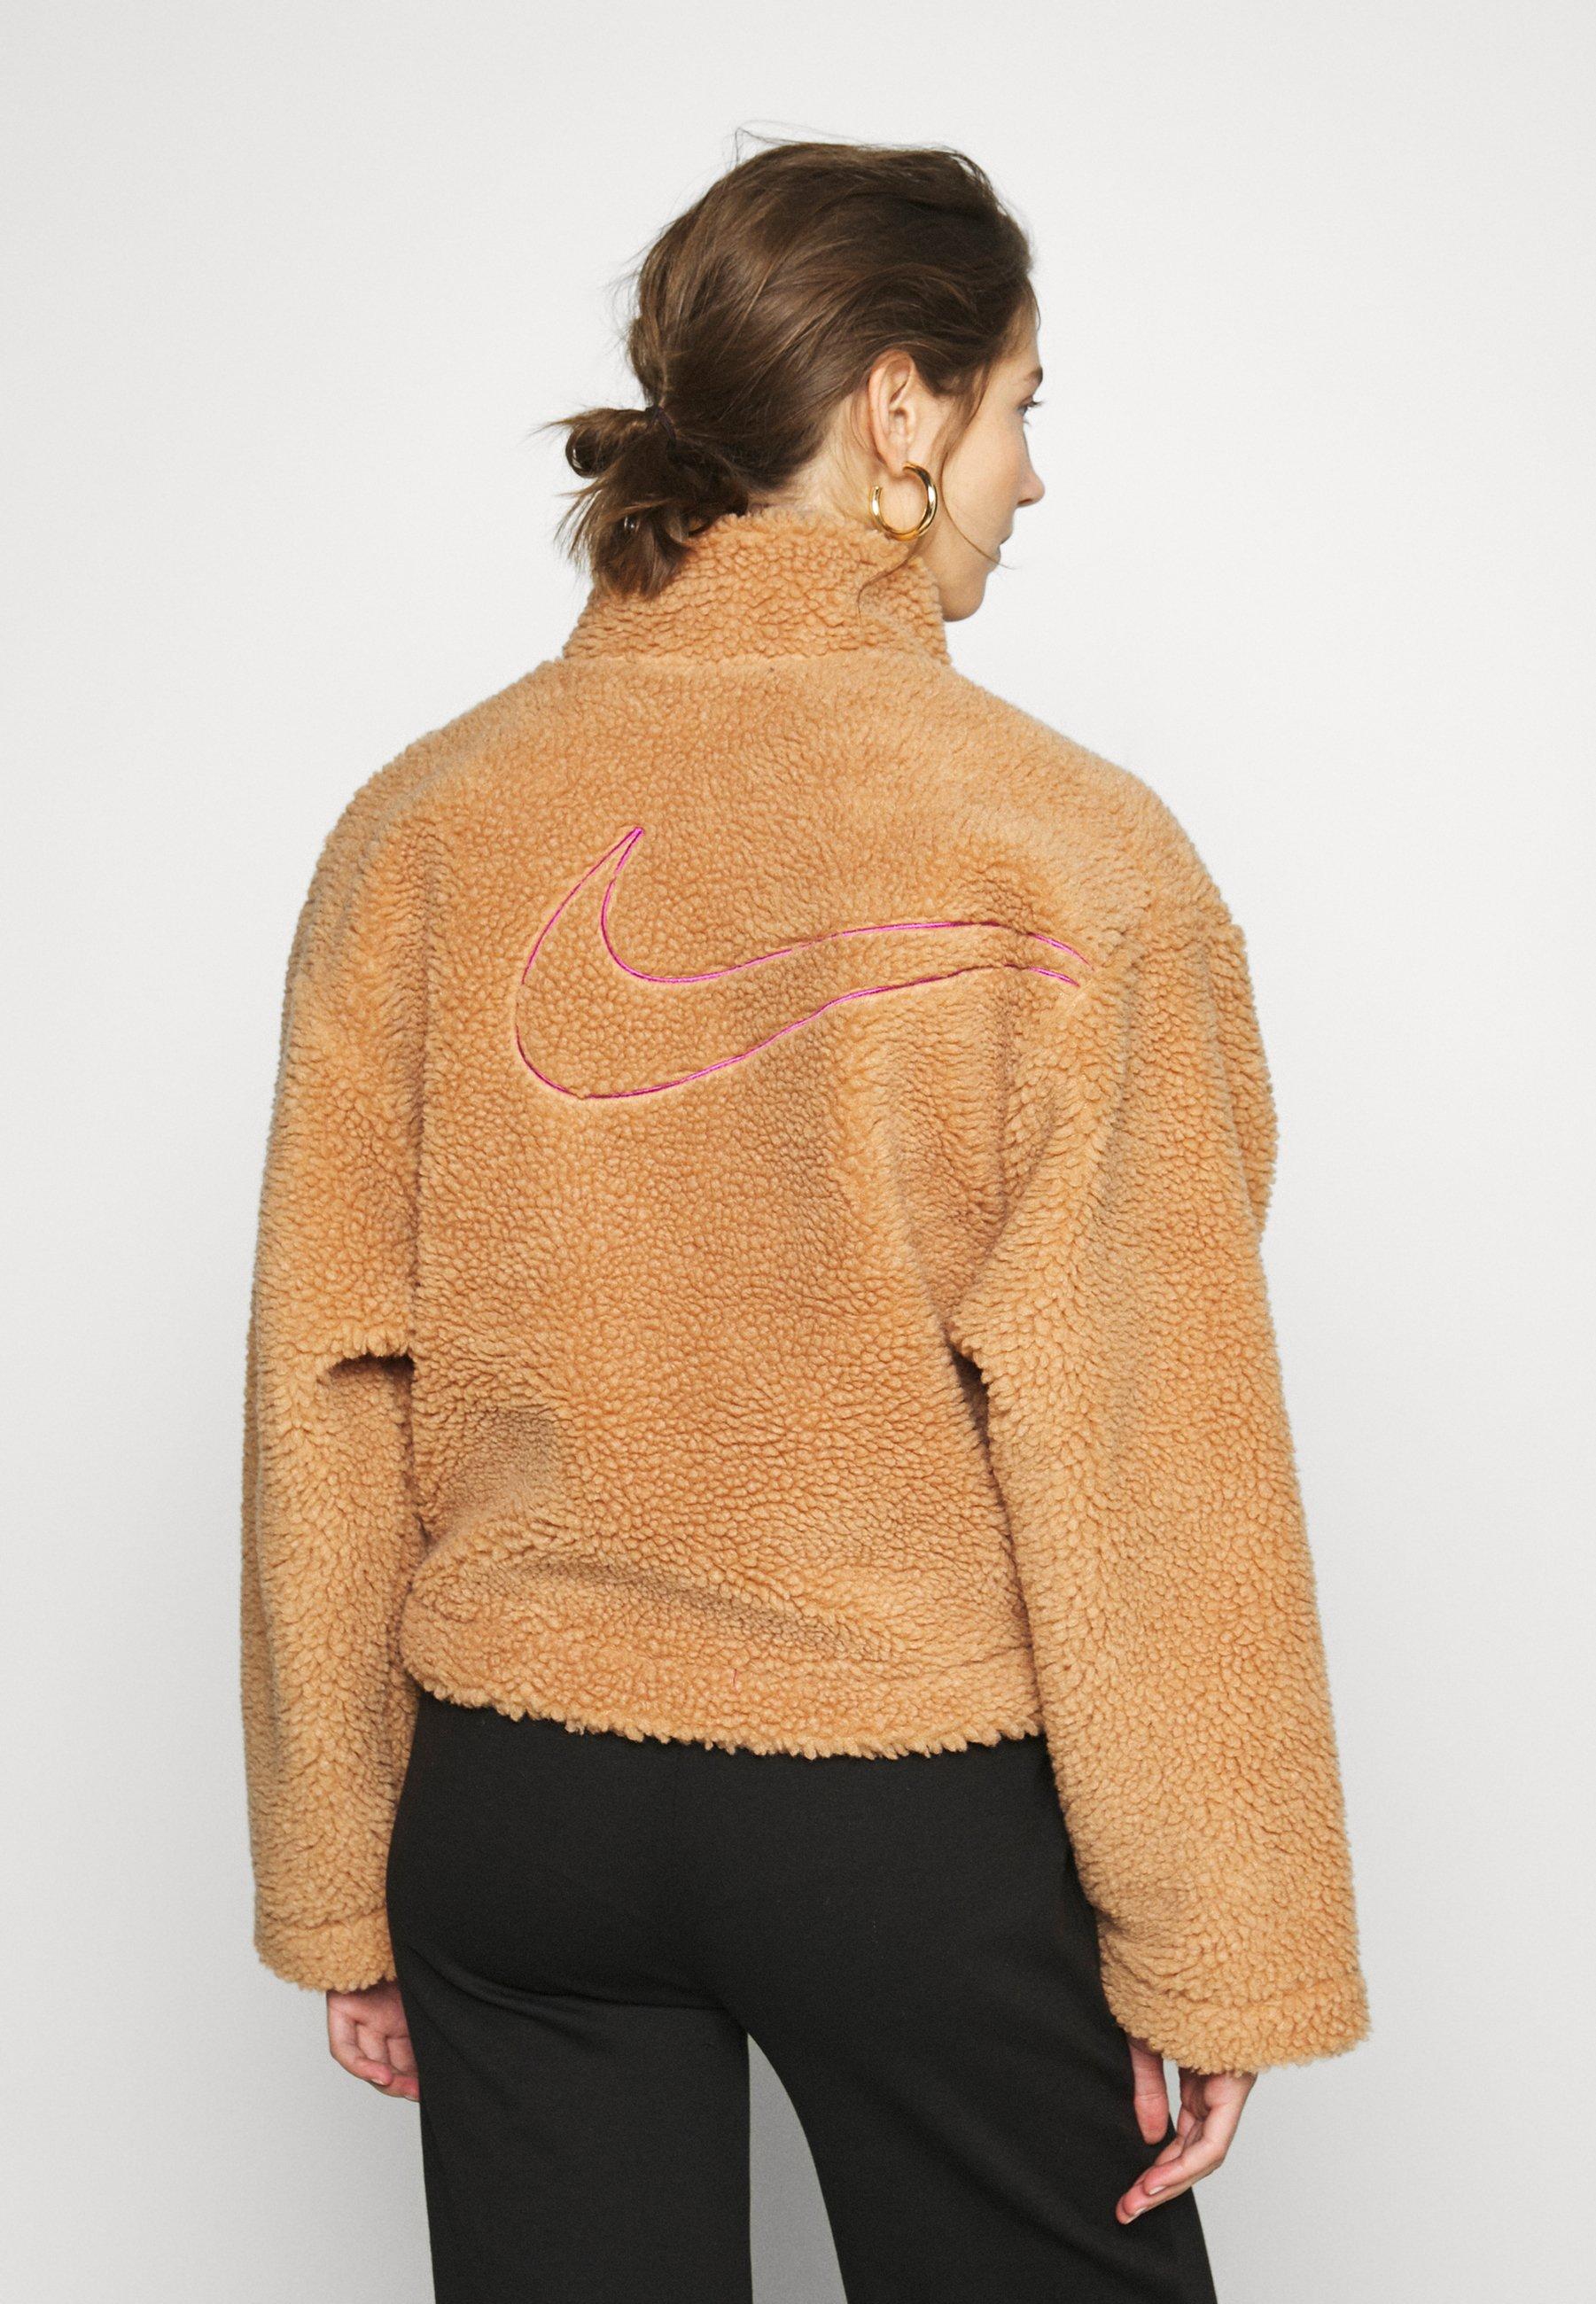 Nike Sportswear Winterjacke flax/cactus flower/braun